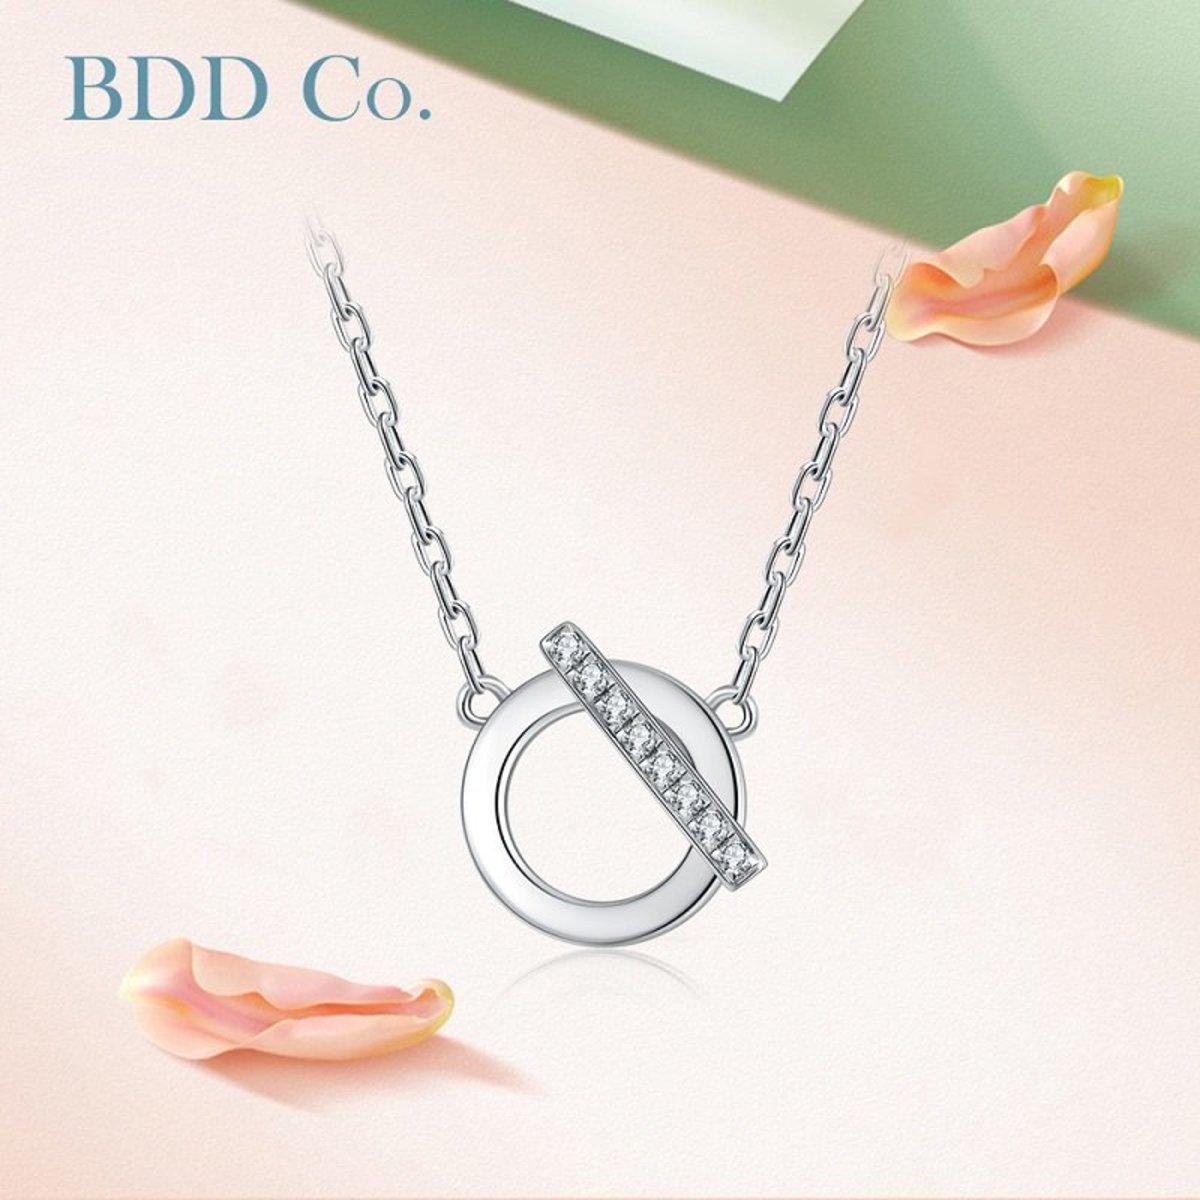 【BDD-Co.】18k白金 設計感幾何鑽石項鏈